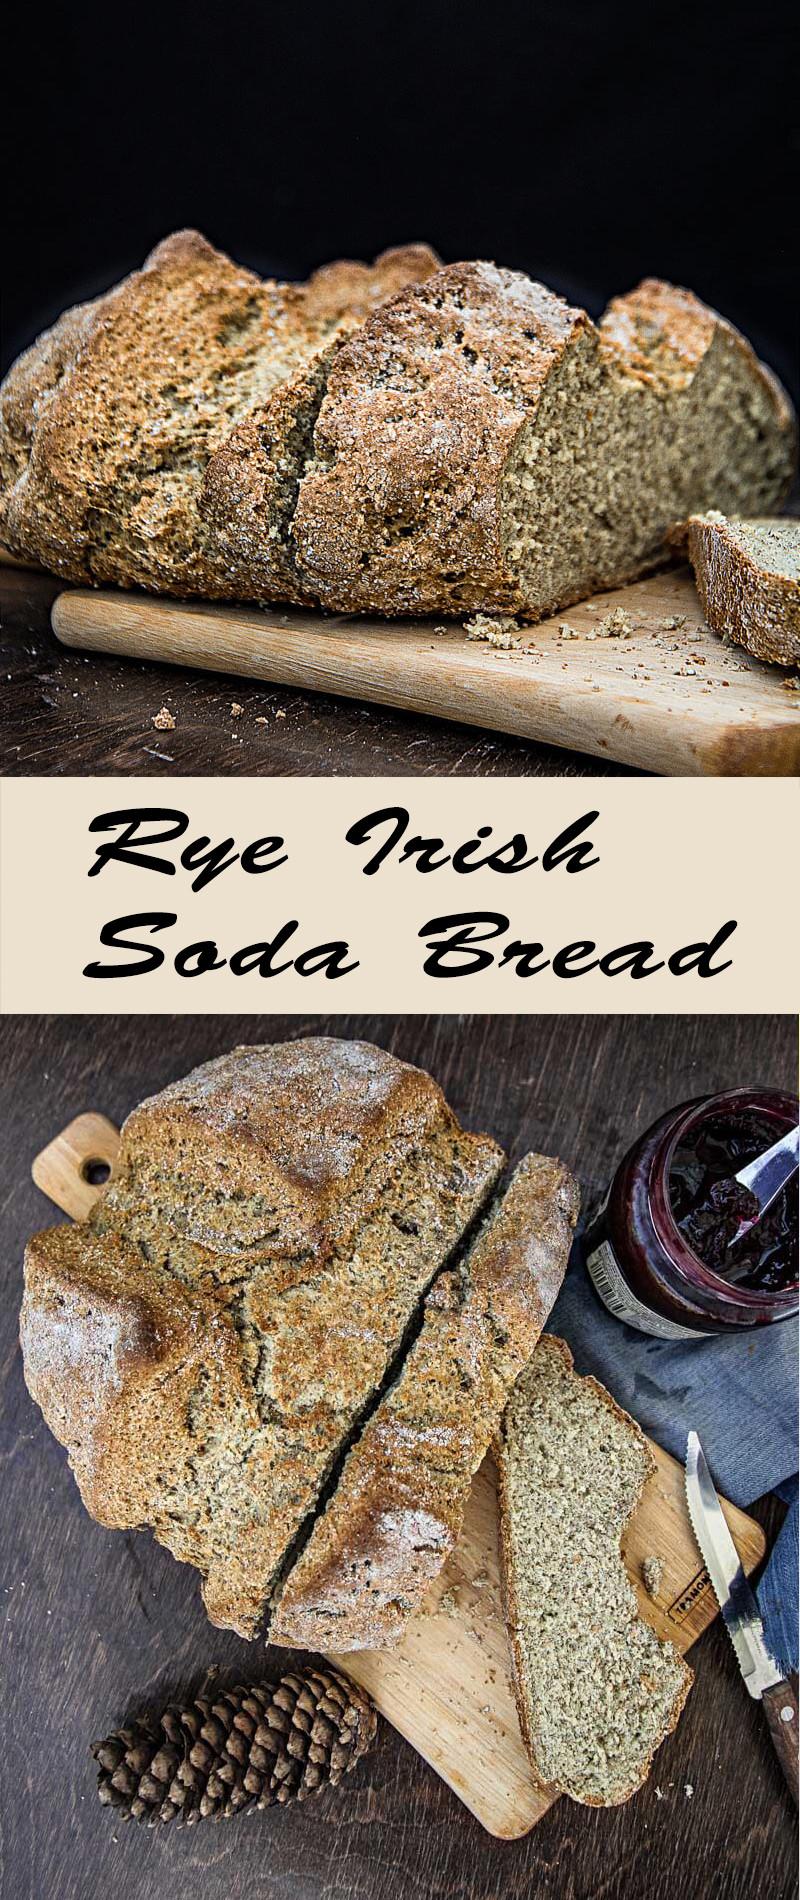 Rye Irish Soda Bread | mygingergarlickitchen.com/ @anupama_dreams